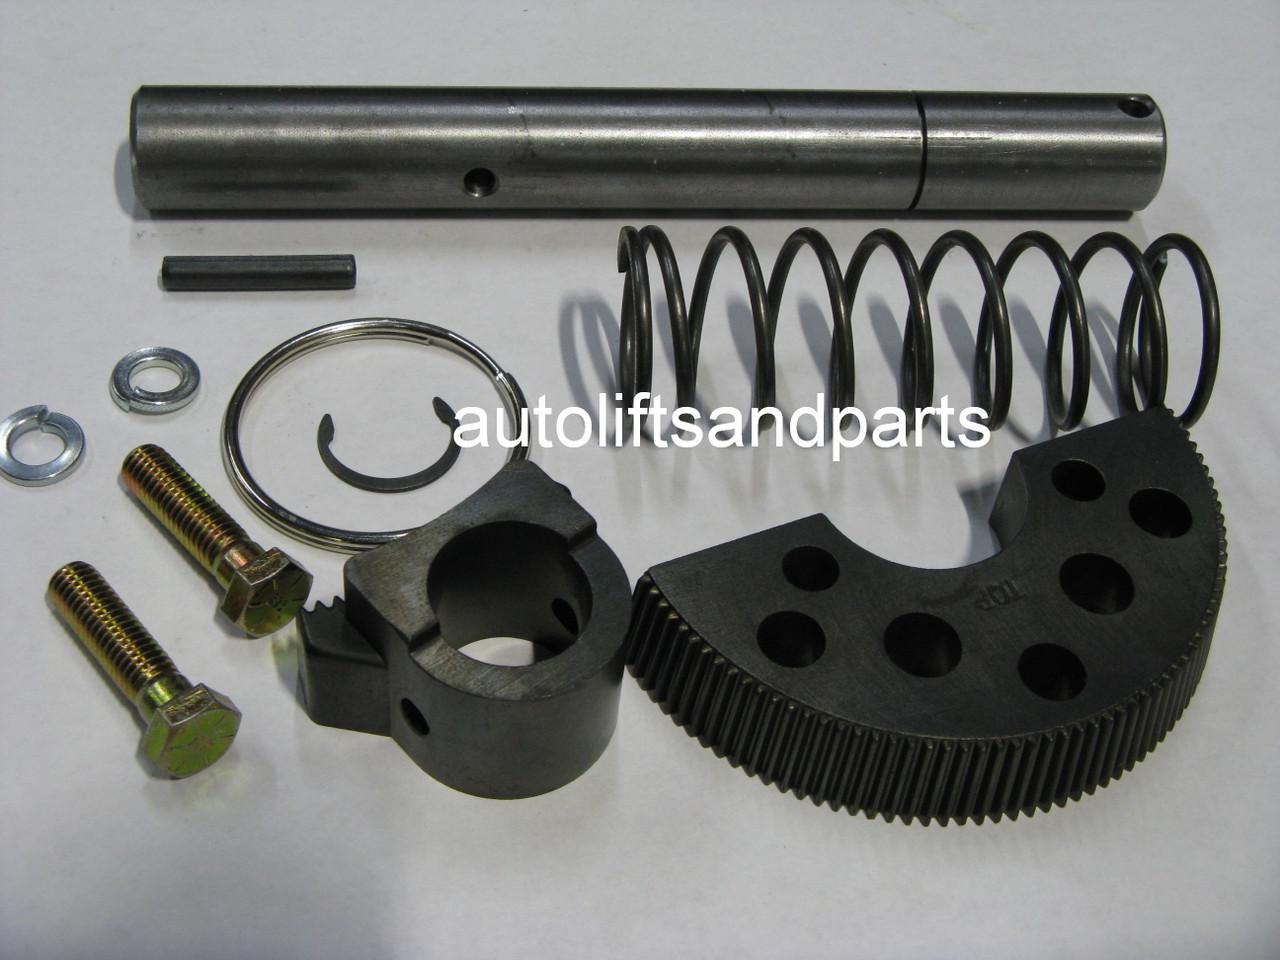 Arm Restraint Kit for Rotary Lift N2209